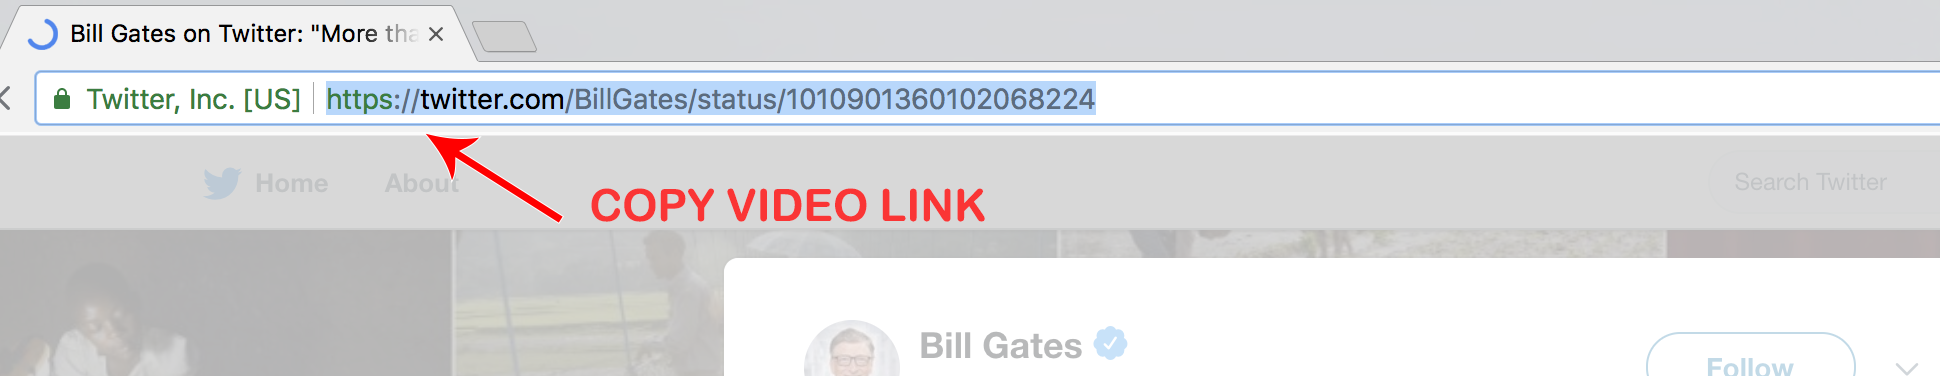 Download Twitter Videos in HD & SD - Tweet Video Downloader